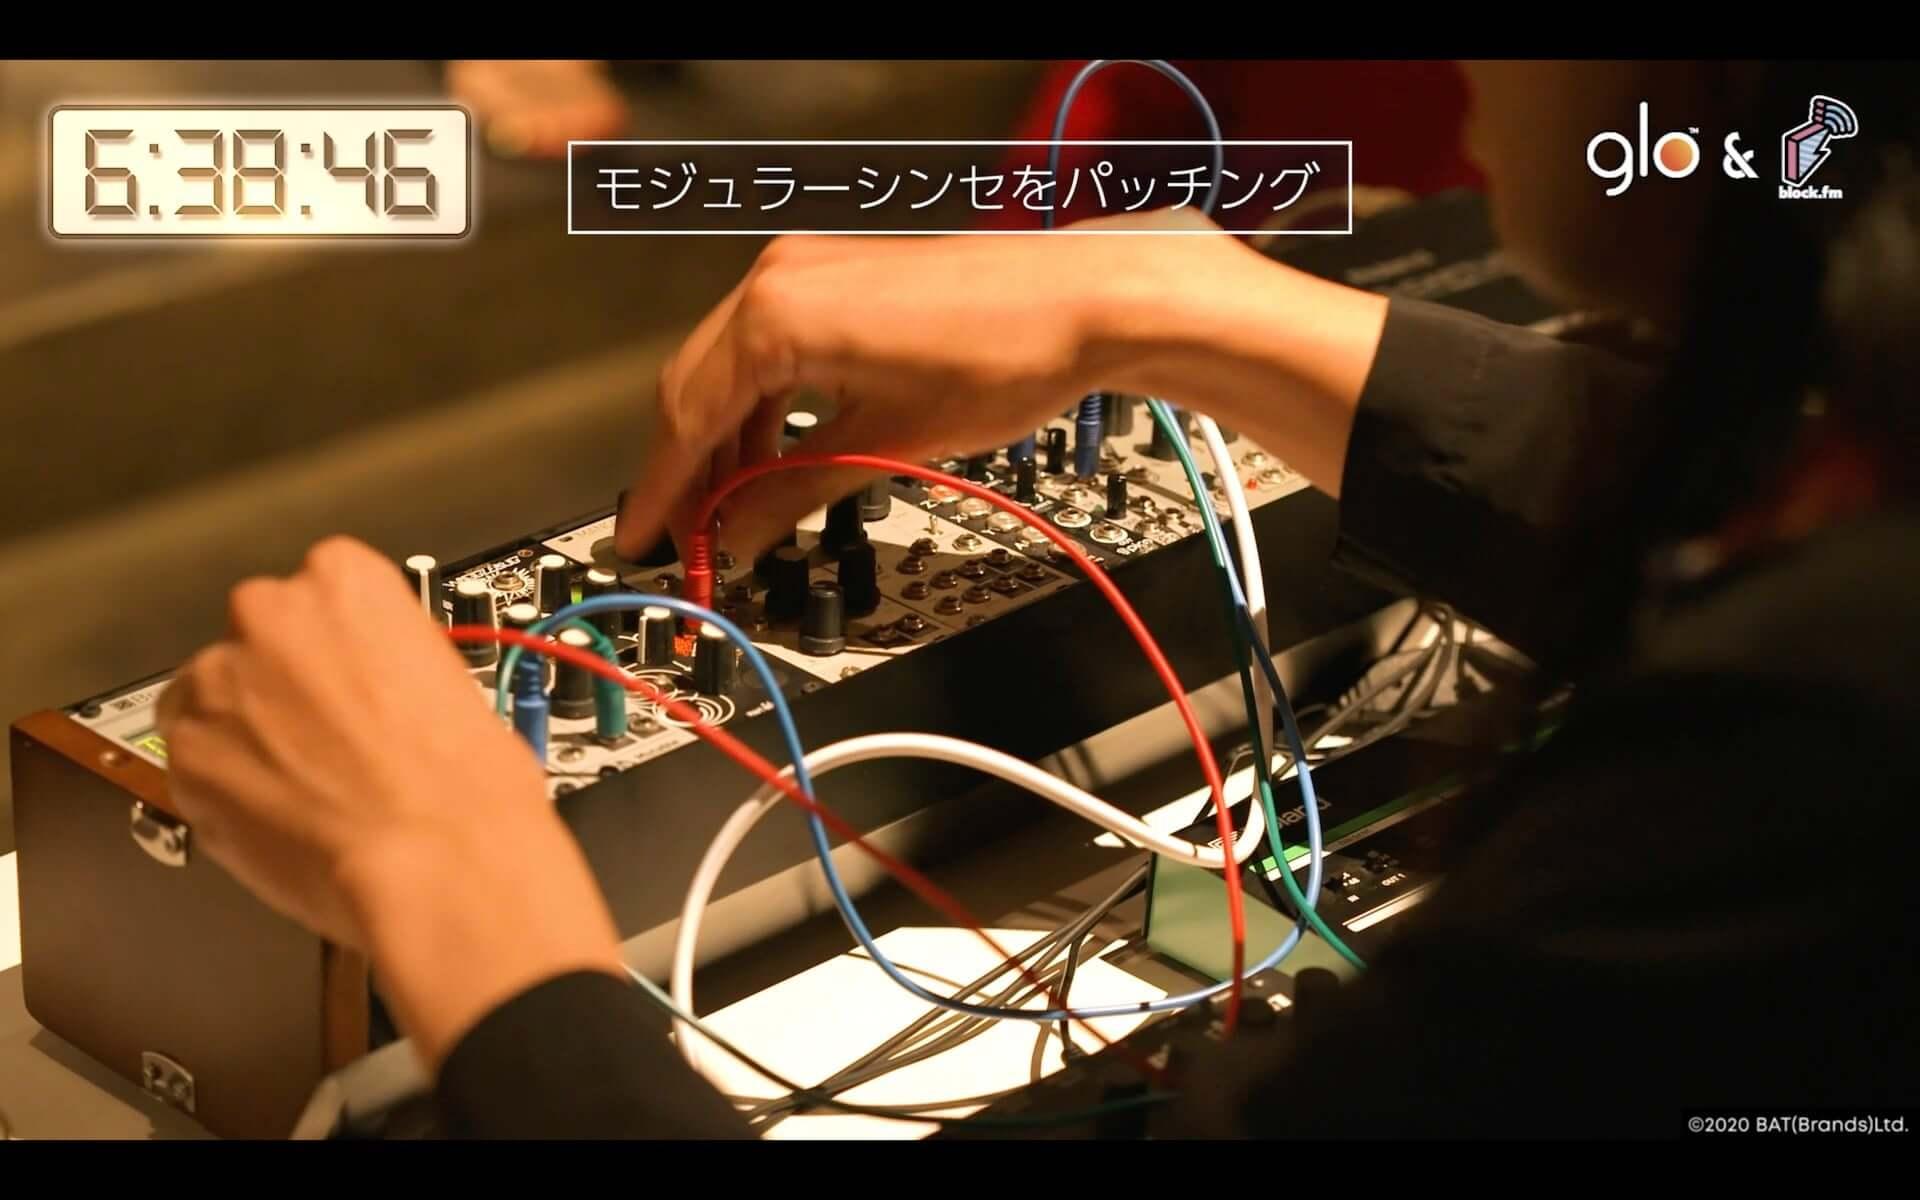 Seiho、tofubeats、Yamato、☆Taku Takahashiが様々なお題に挑戦!glo™とblock.fmが贈る動画シリーズが公開 music200916_glo-blockfm_14-1920x1200